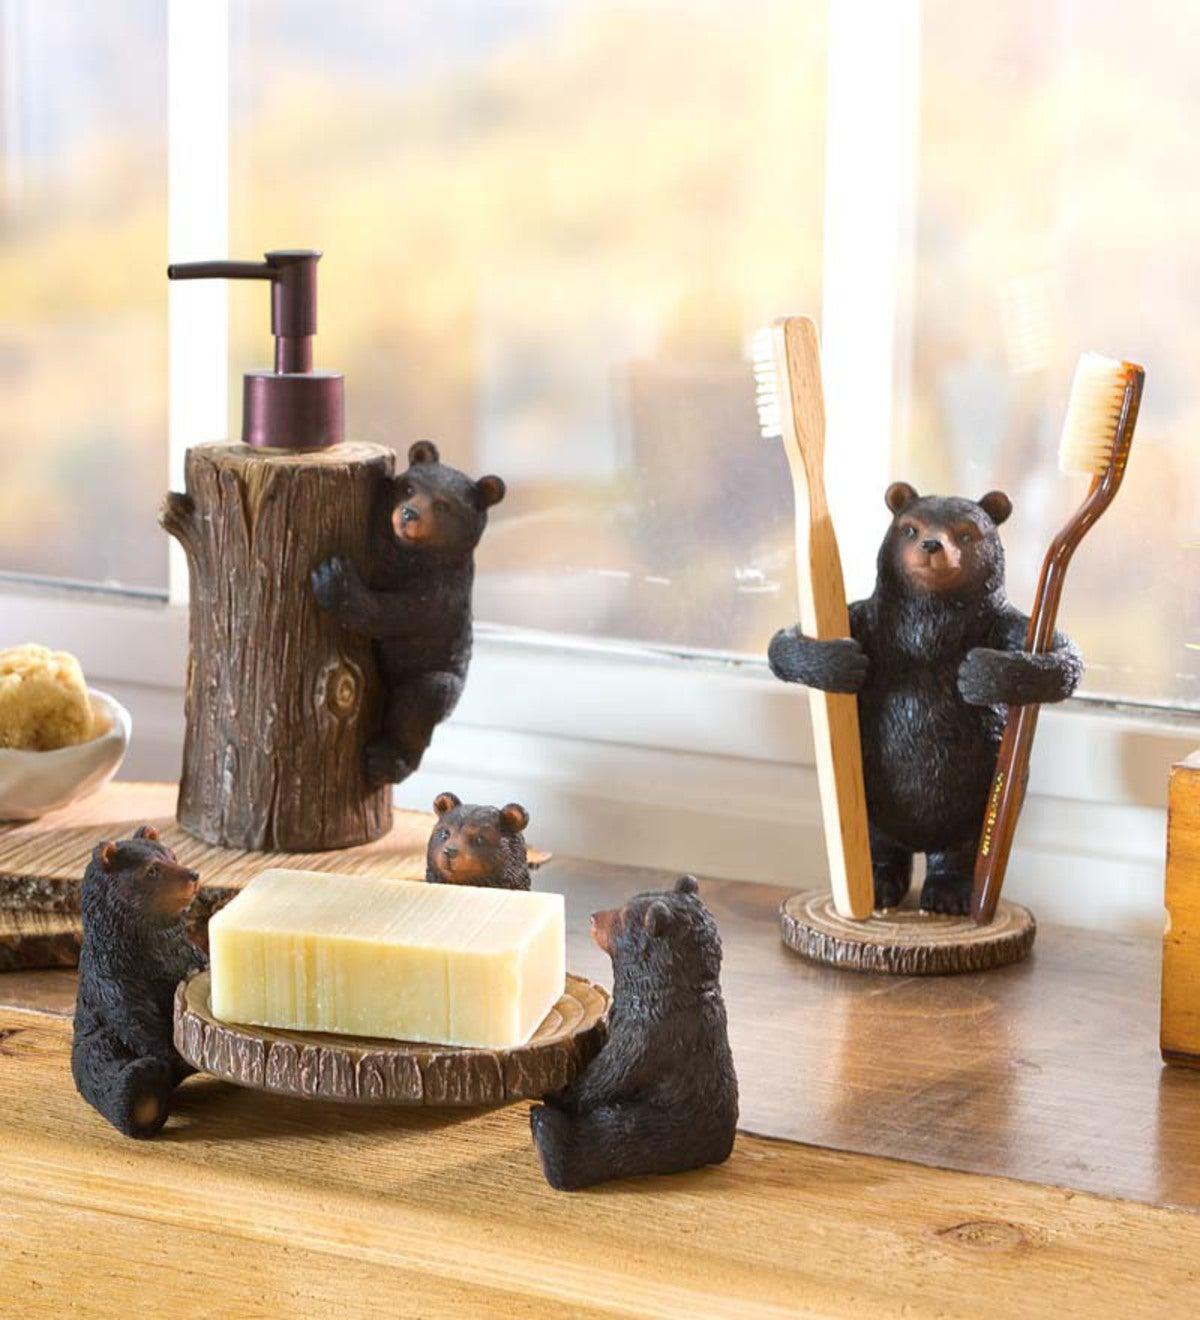 Genial Resin Bear Bathroom Set: Toothbrush Holder, Soap Dispenser And Soap Dish